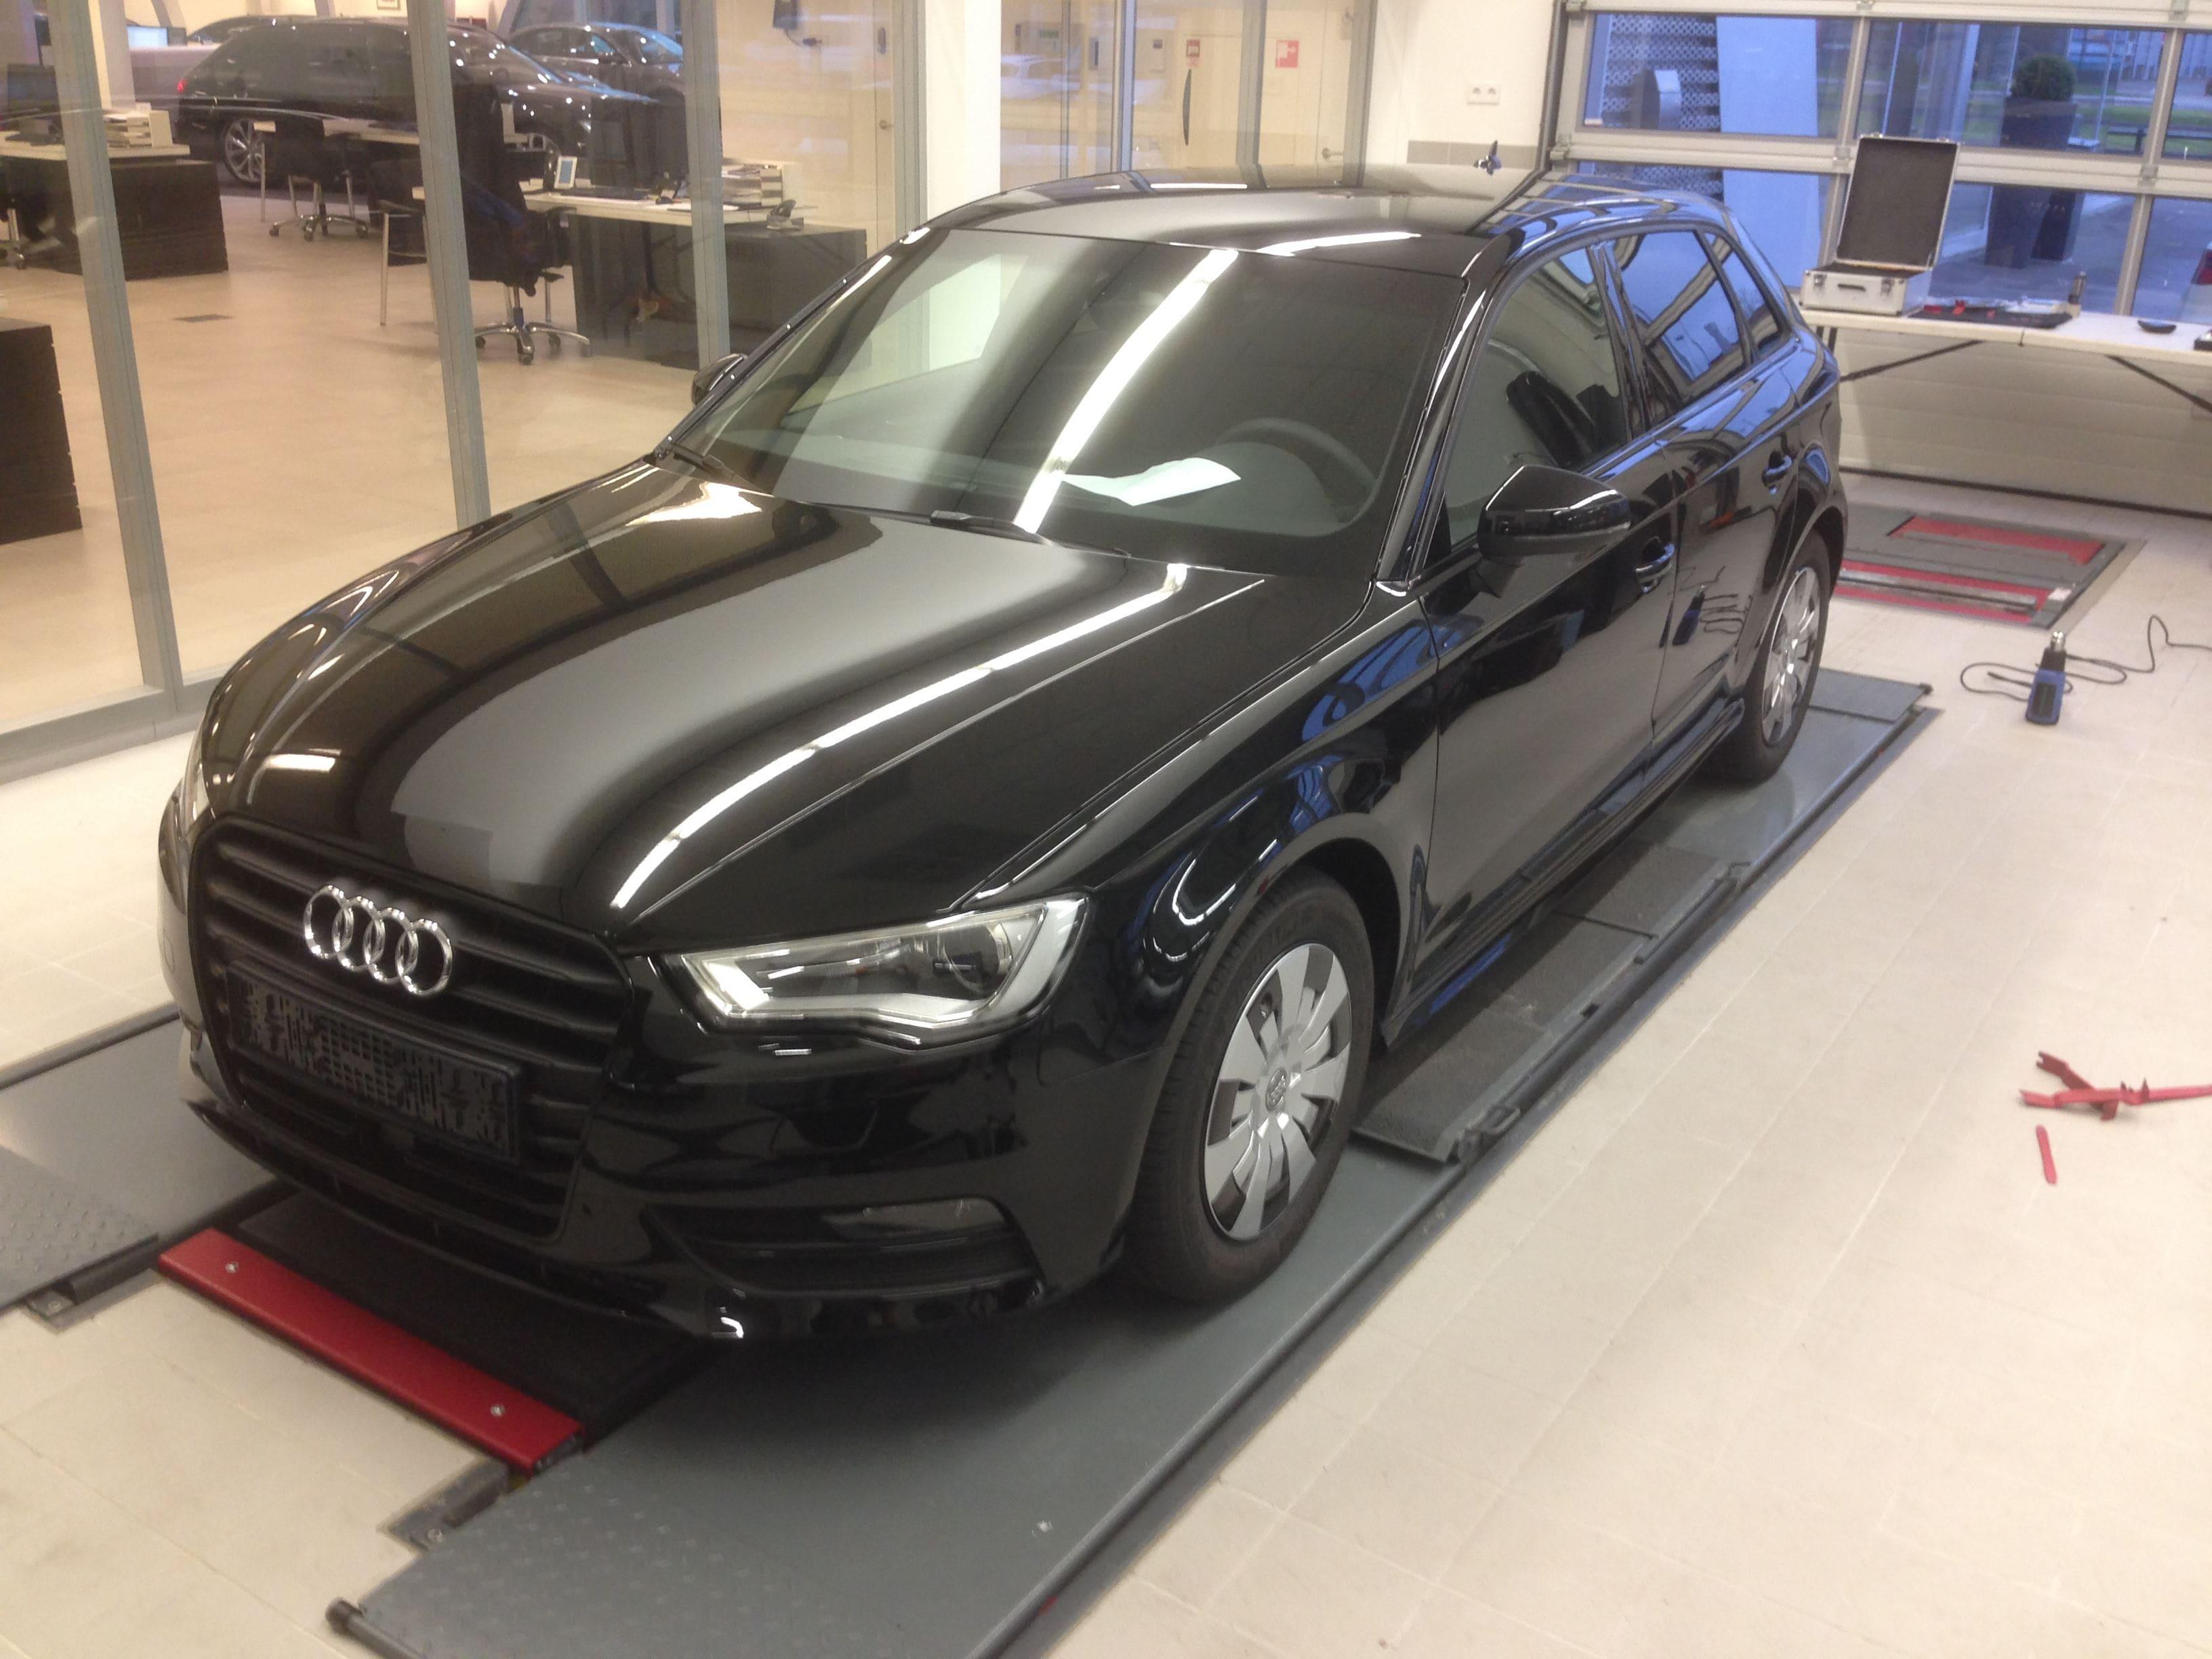 Audi A3 2014 met Mat Zwarte Wrap, Carwrapping door Wrapmyride.nu Foto-nr:4460, ©2021